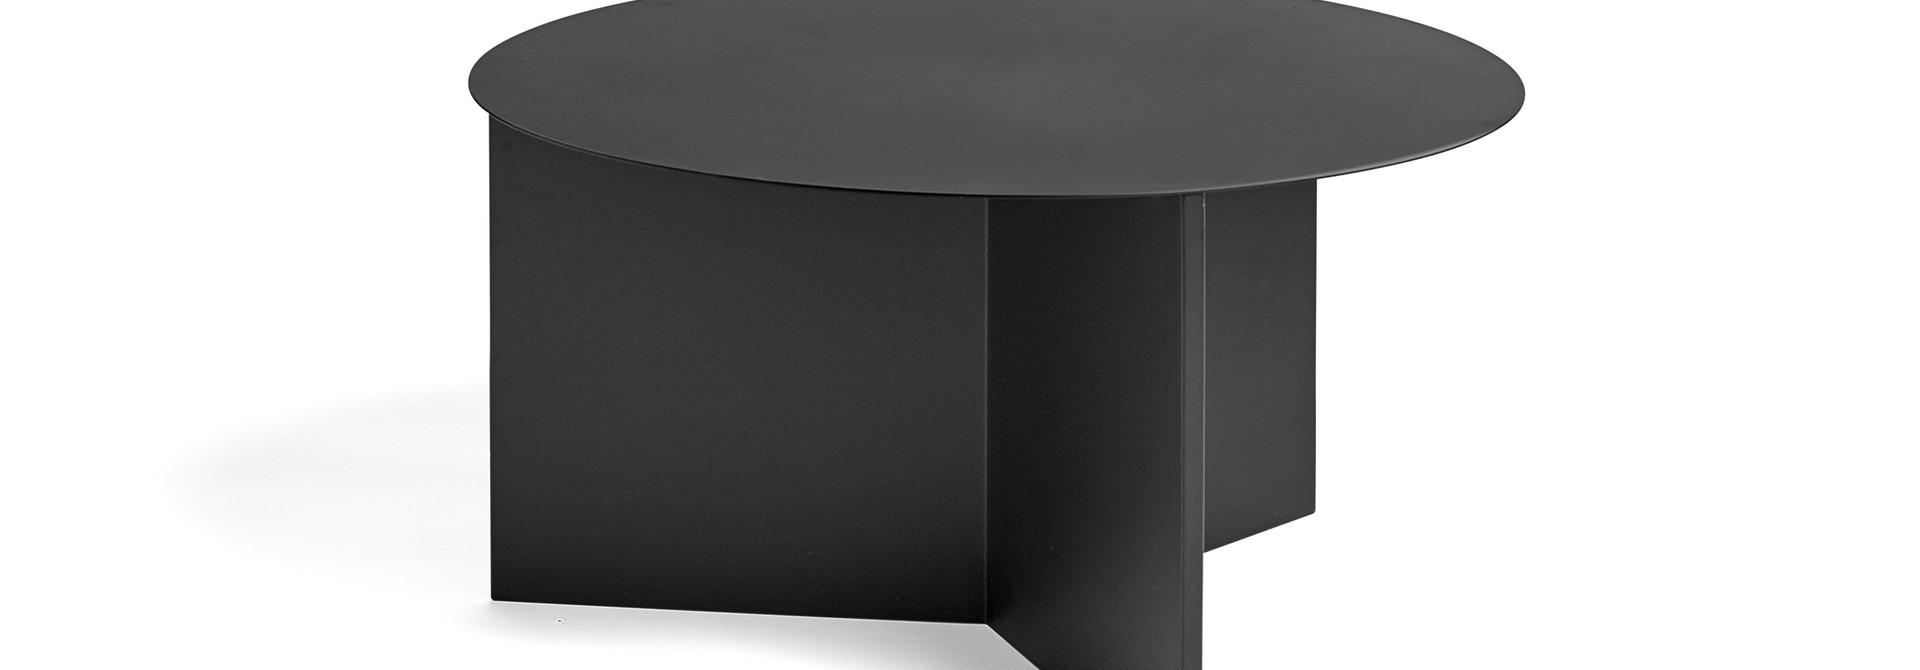 Slit table - XL coffee table